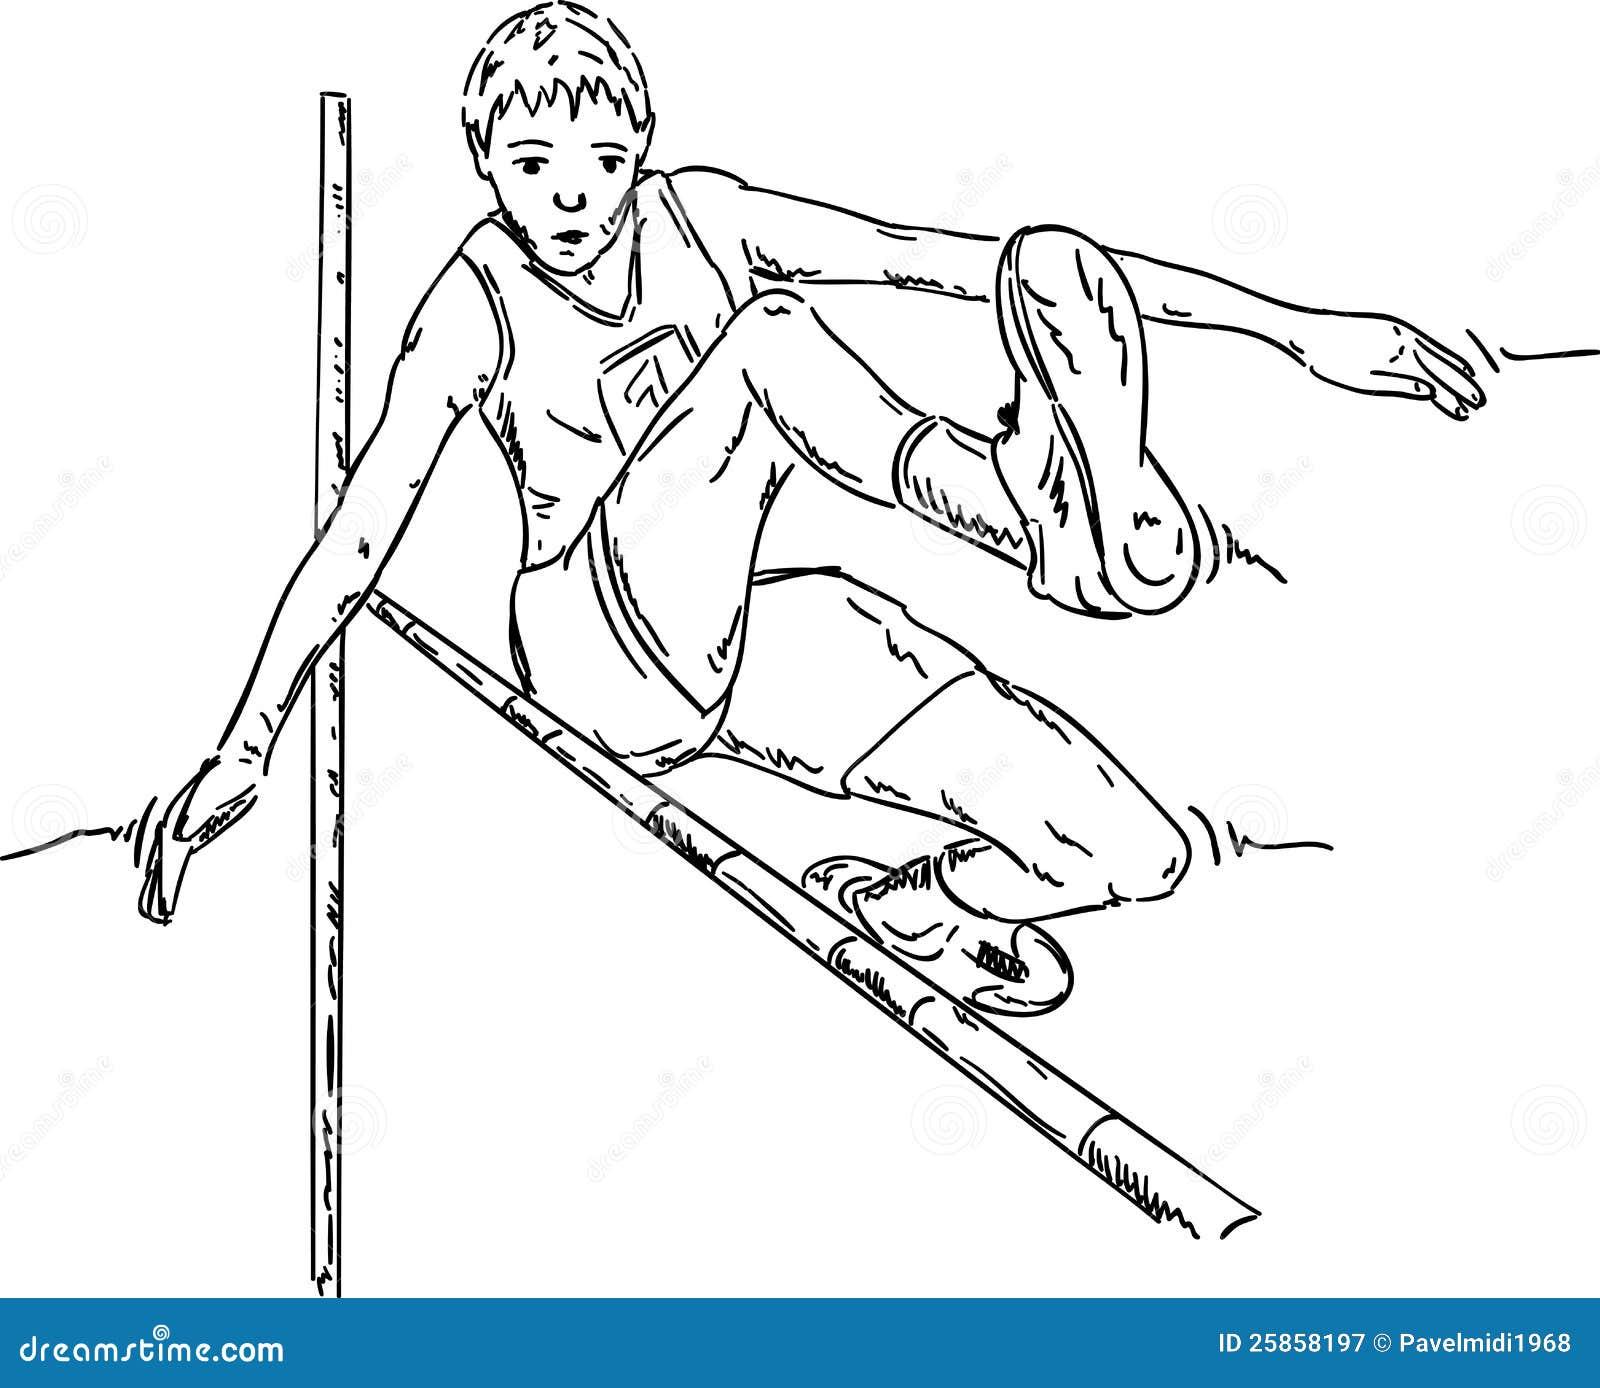 HIGH JUMP BASICS FOR LITTLE ATHLETICS TRAINING